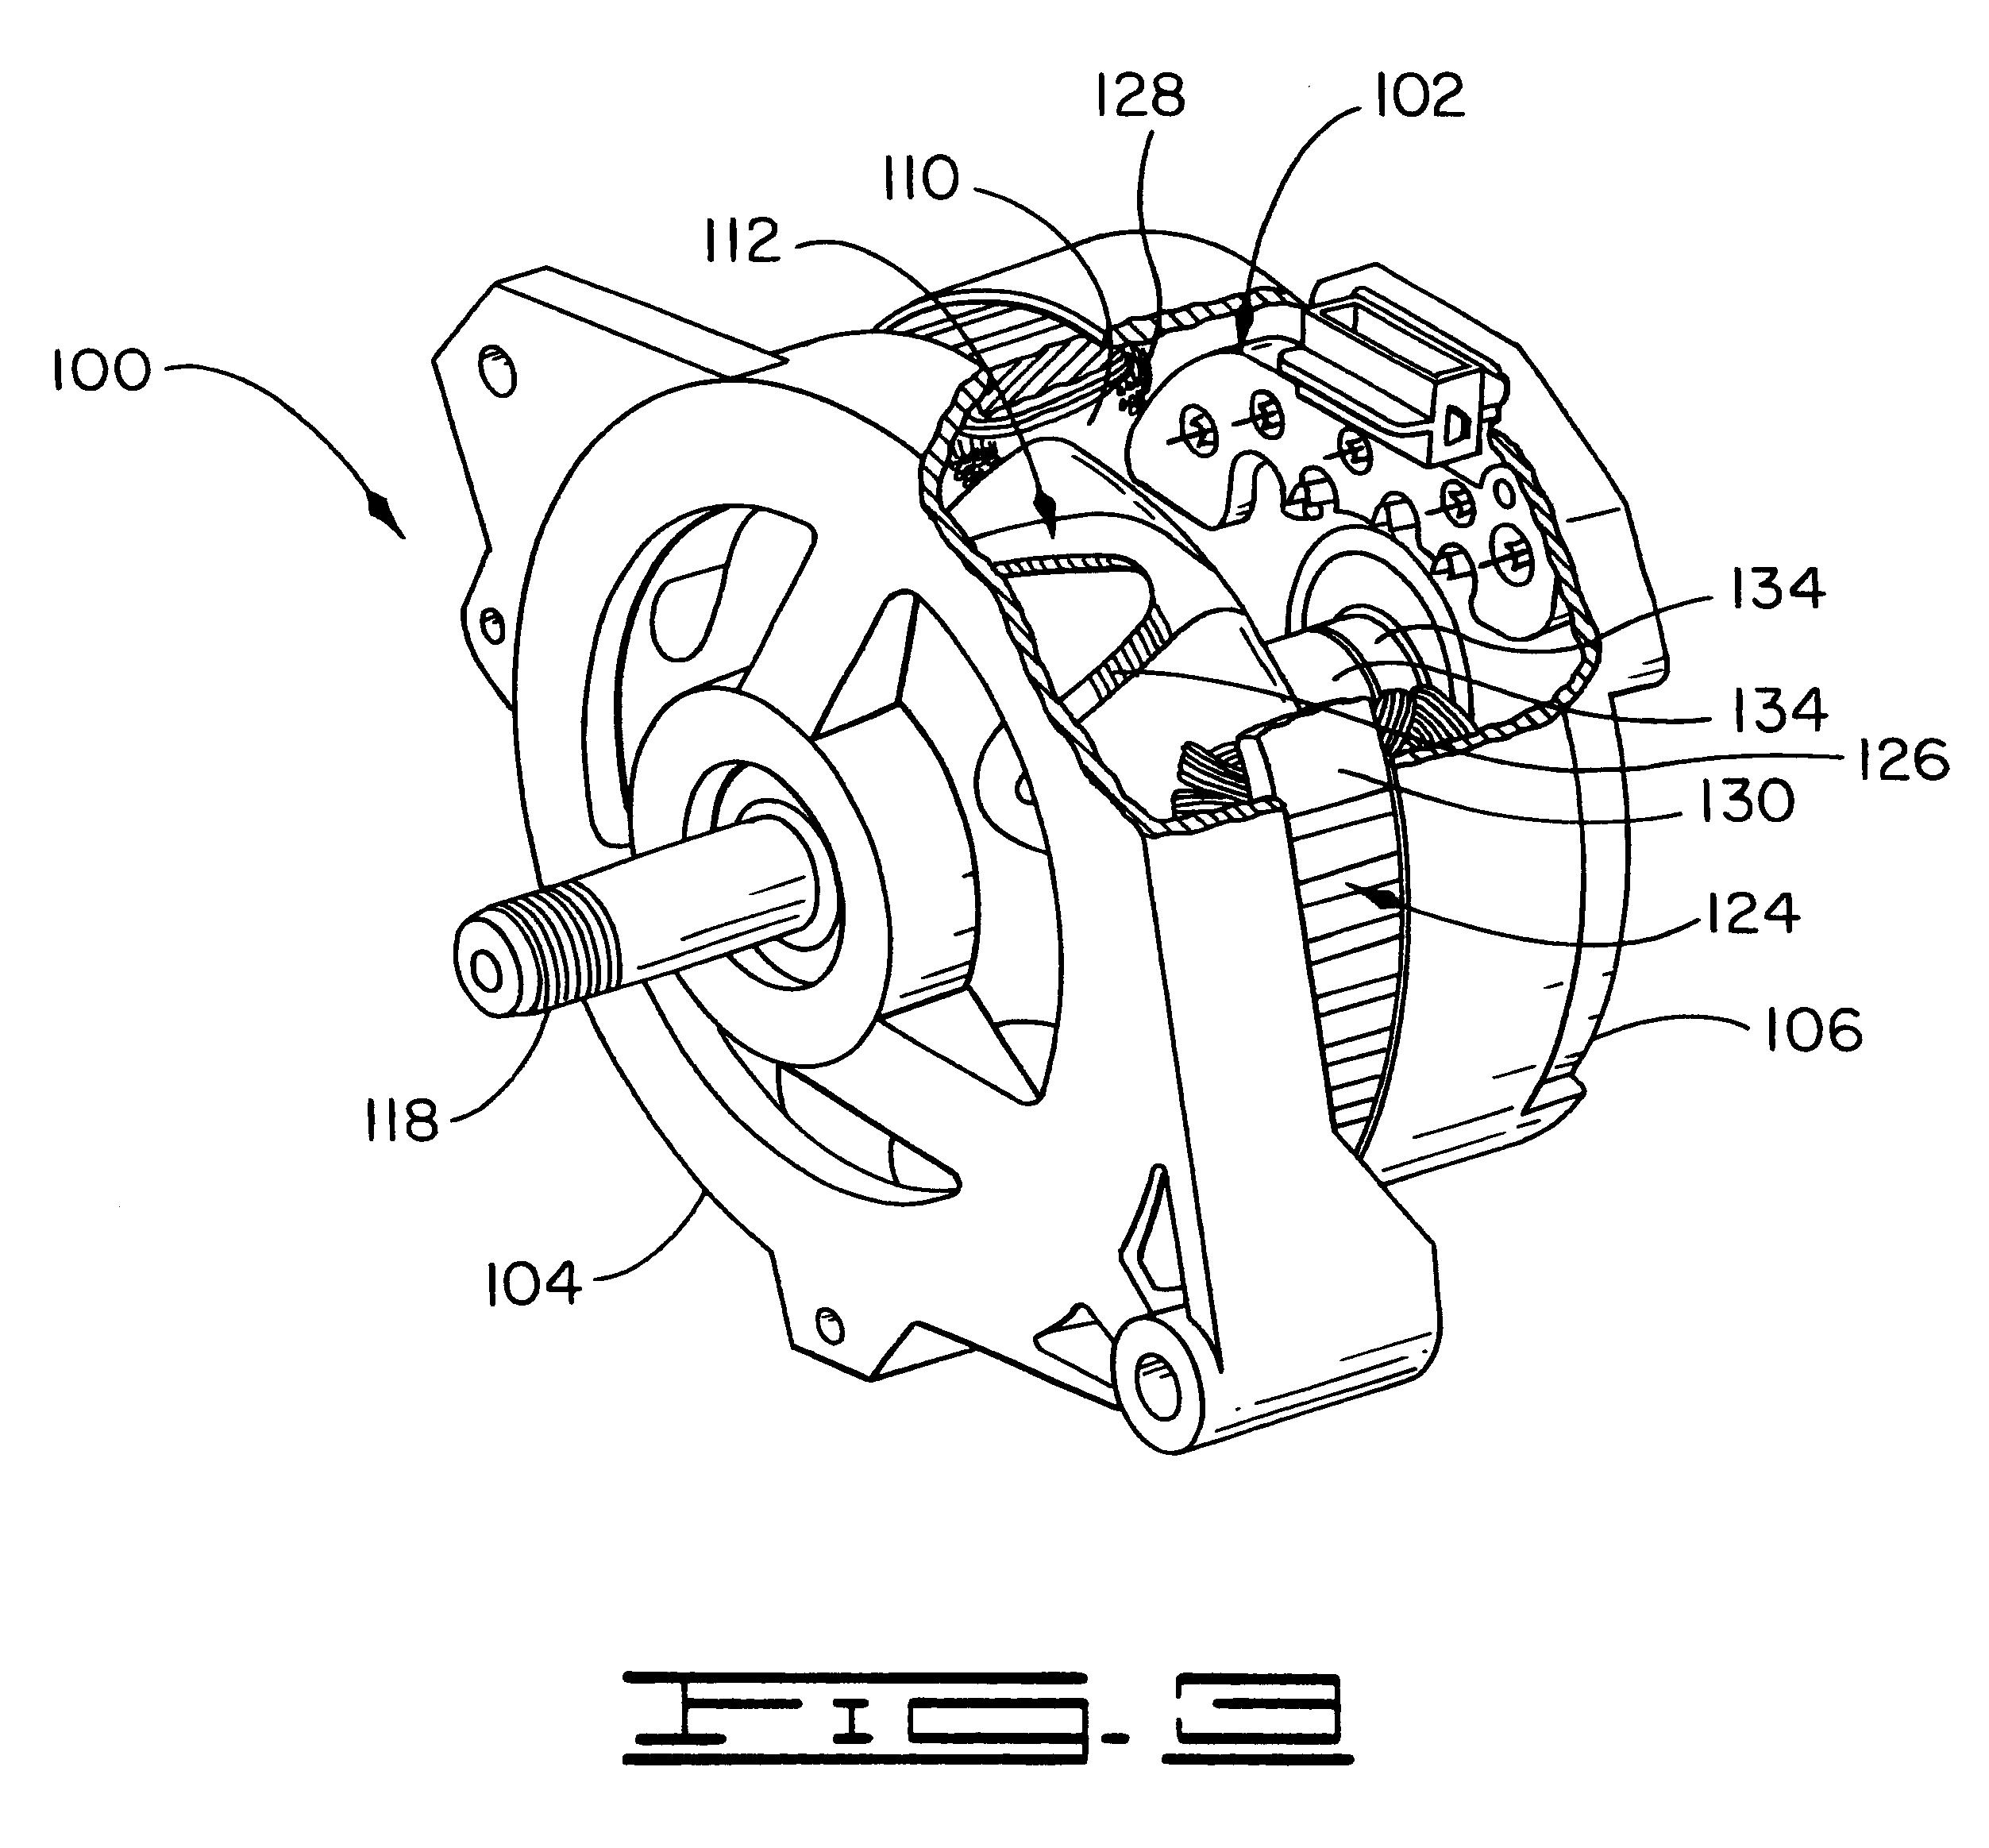 1973 Ford Mustang Alternator Wiring Diagram - Schematics Online  Mustang Tail Light Wiring Diagram on